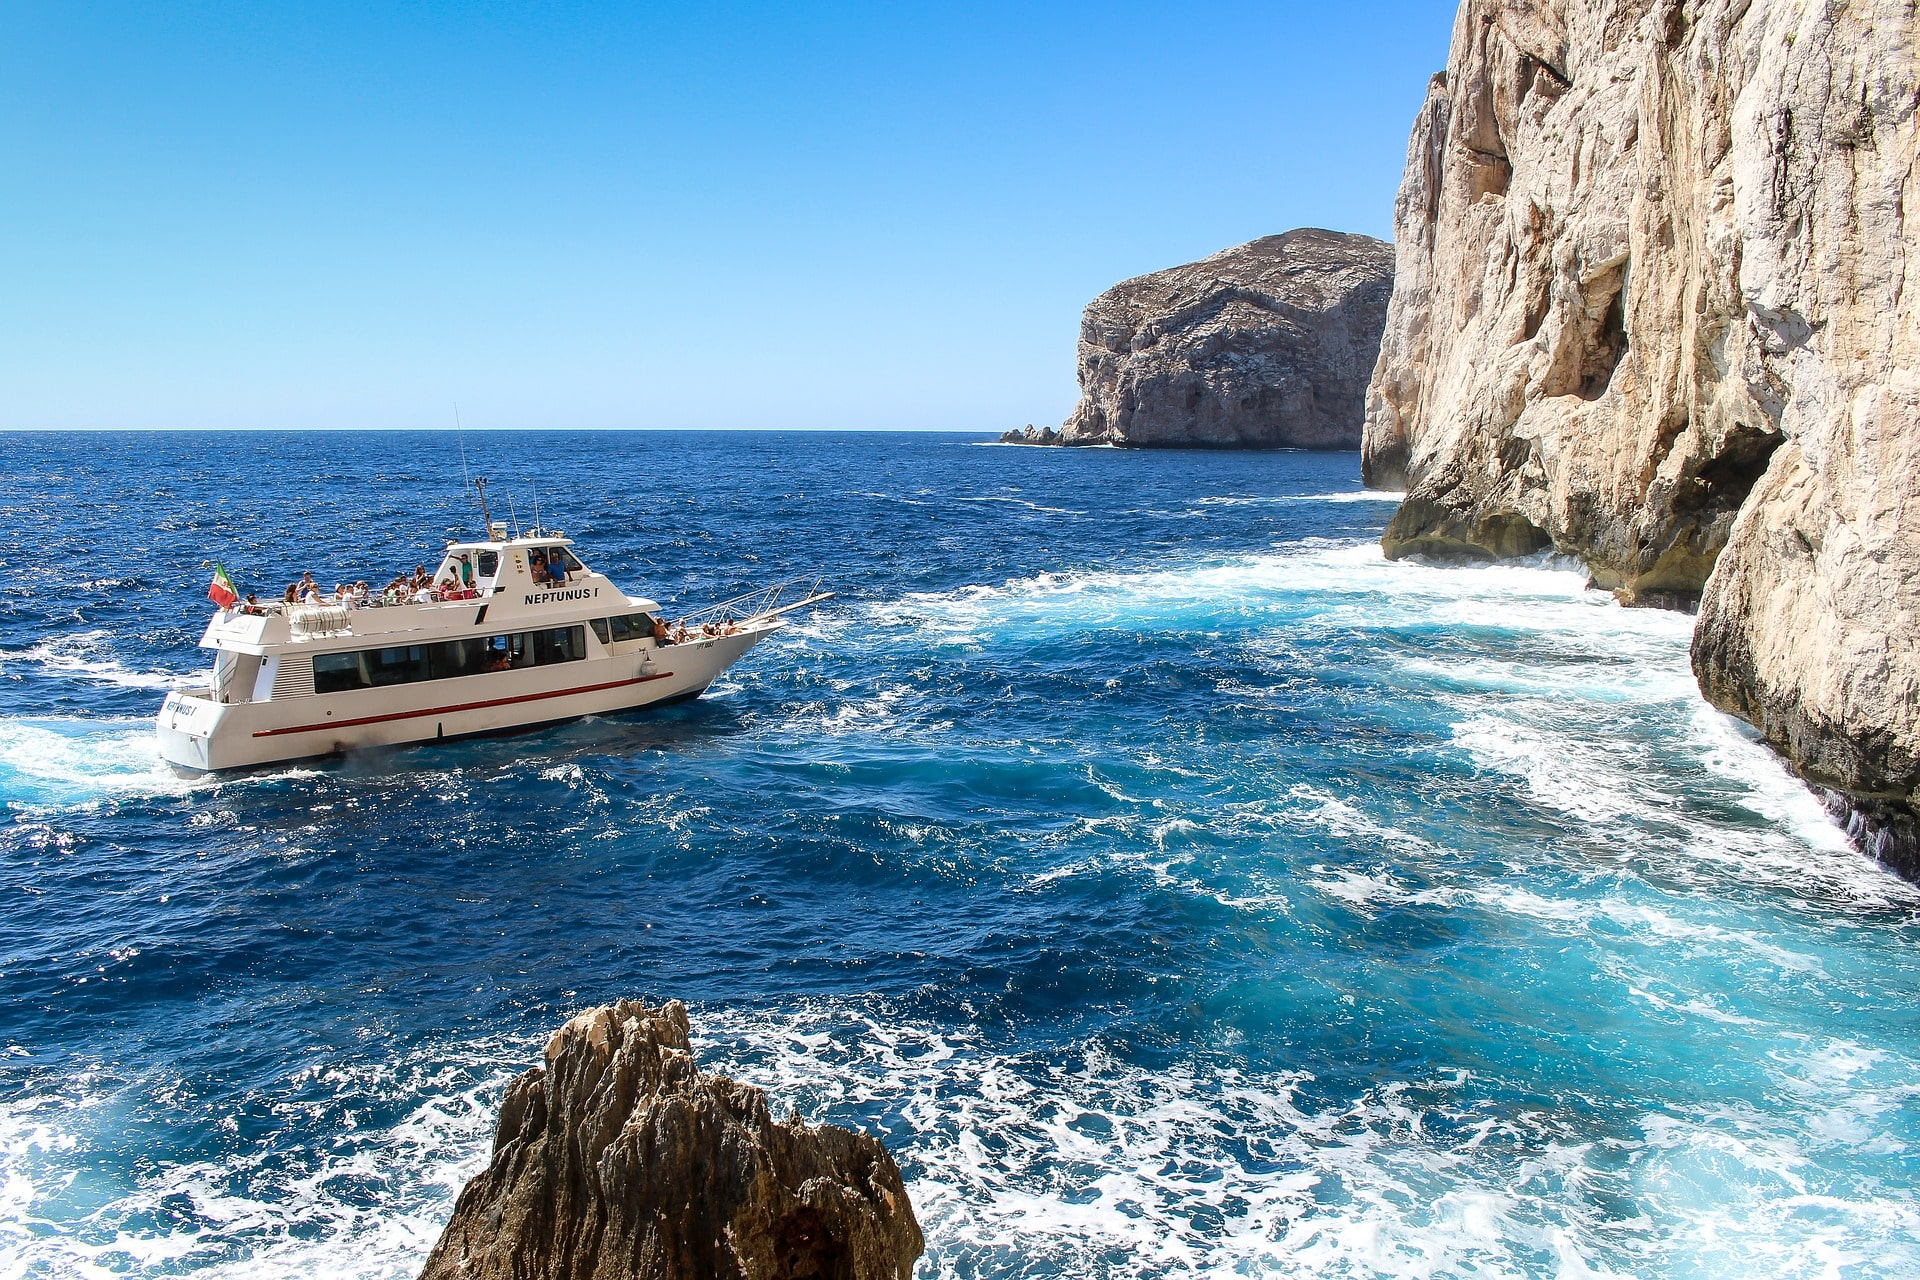 Gita in barca alle grotte di Palinuro